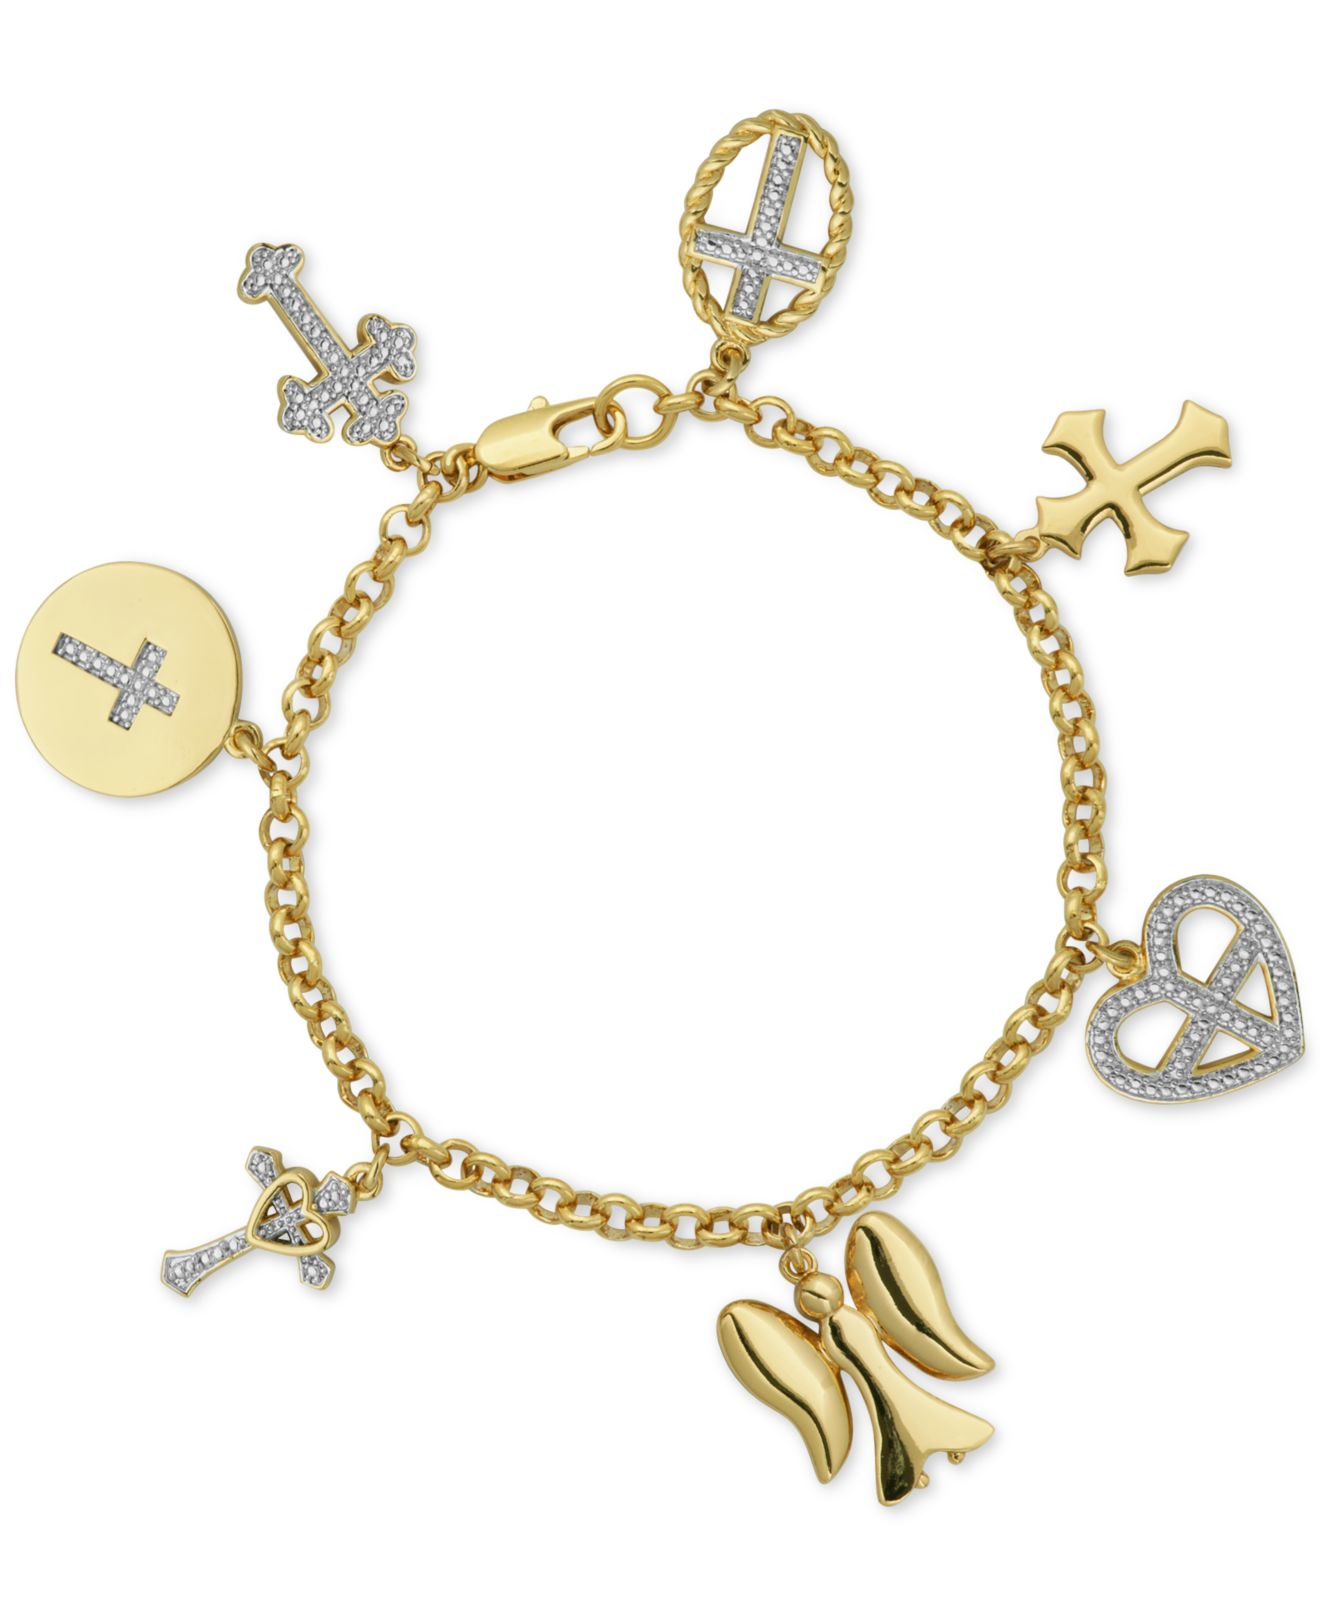 Inspirational Charm Bracelets: Macy's Diamond Accent Inspirational Charm Bracelet In 18k